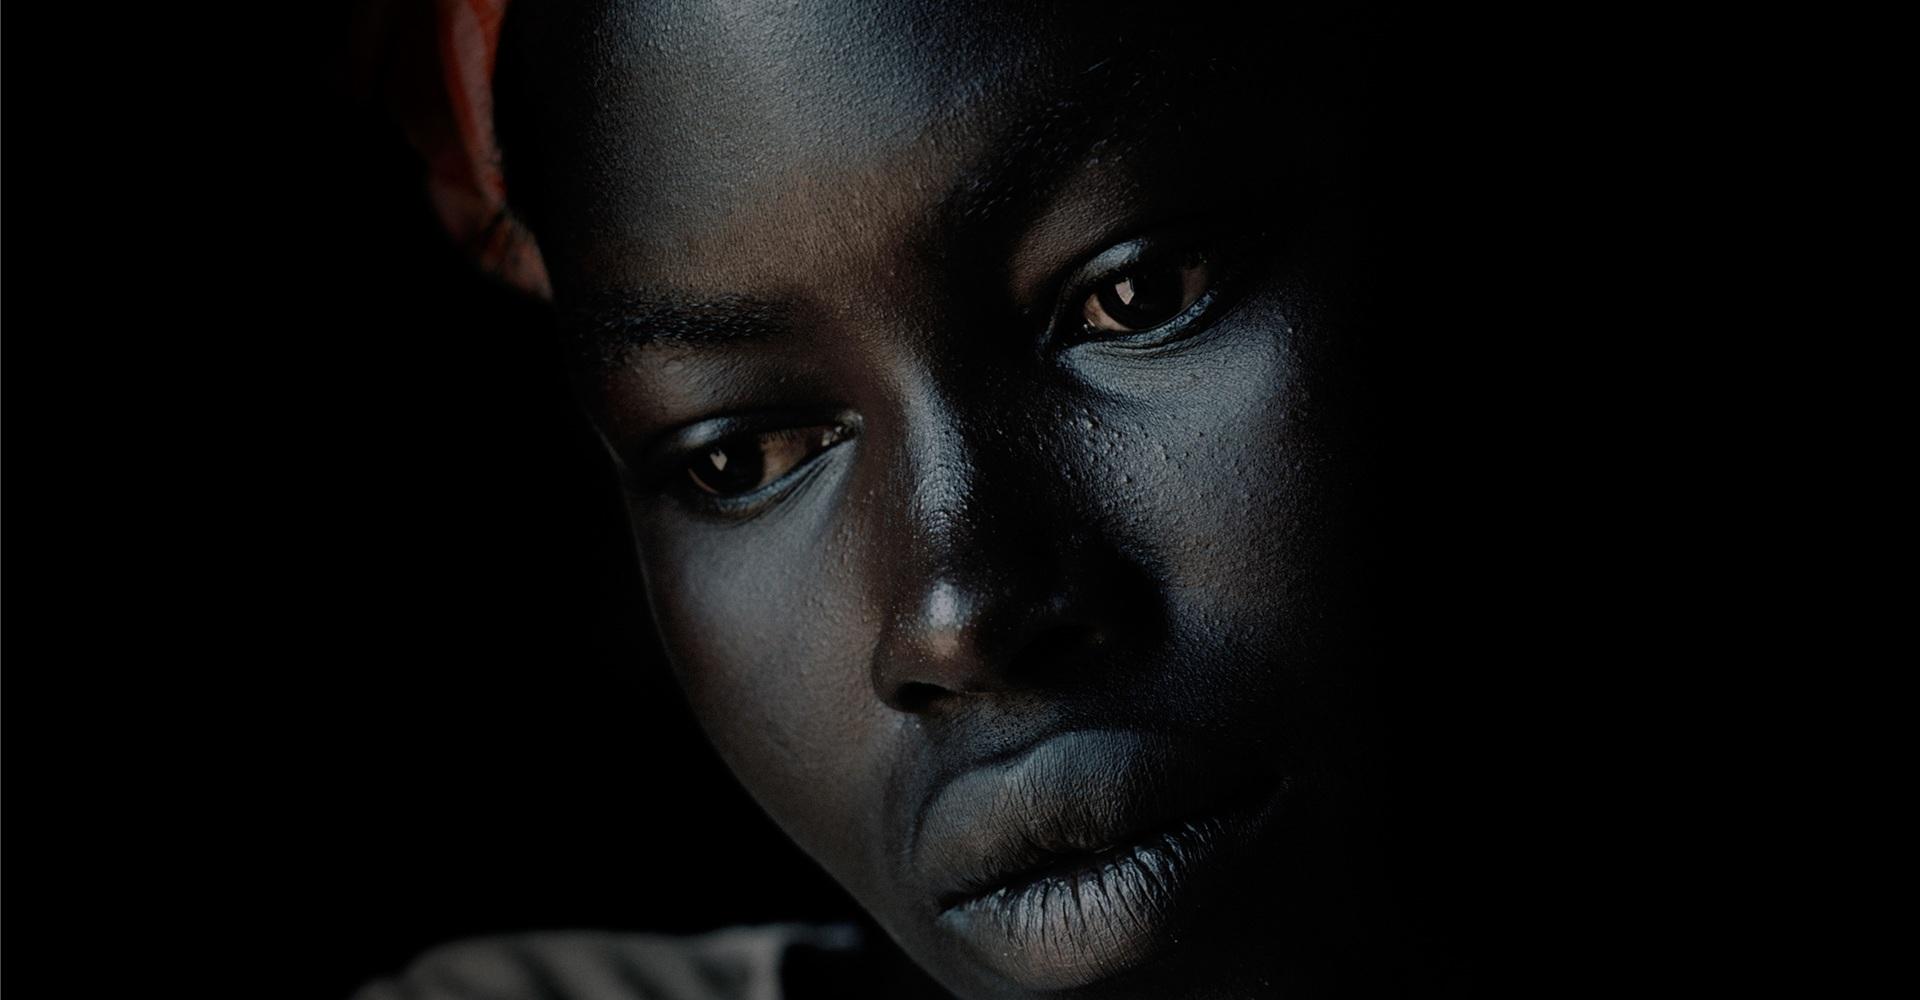 Malaria: Blood, Sweat, and Tears